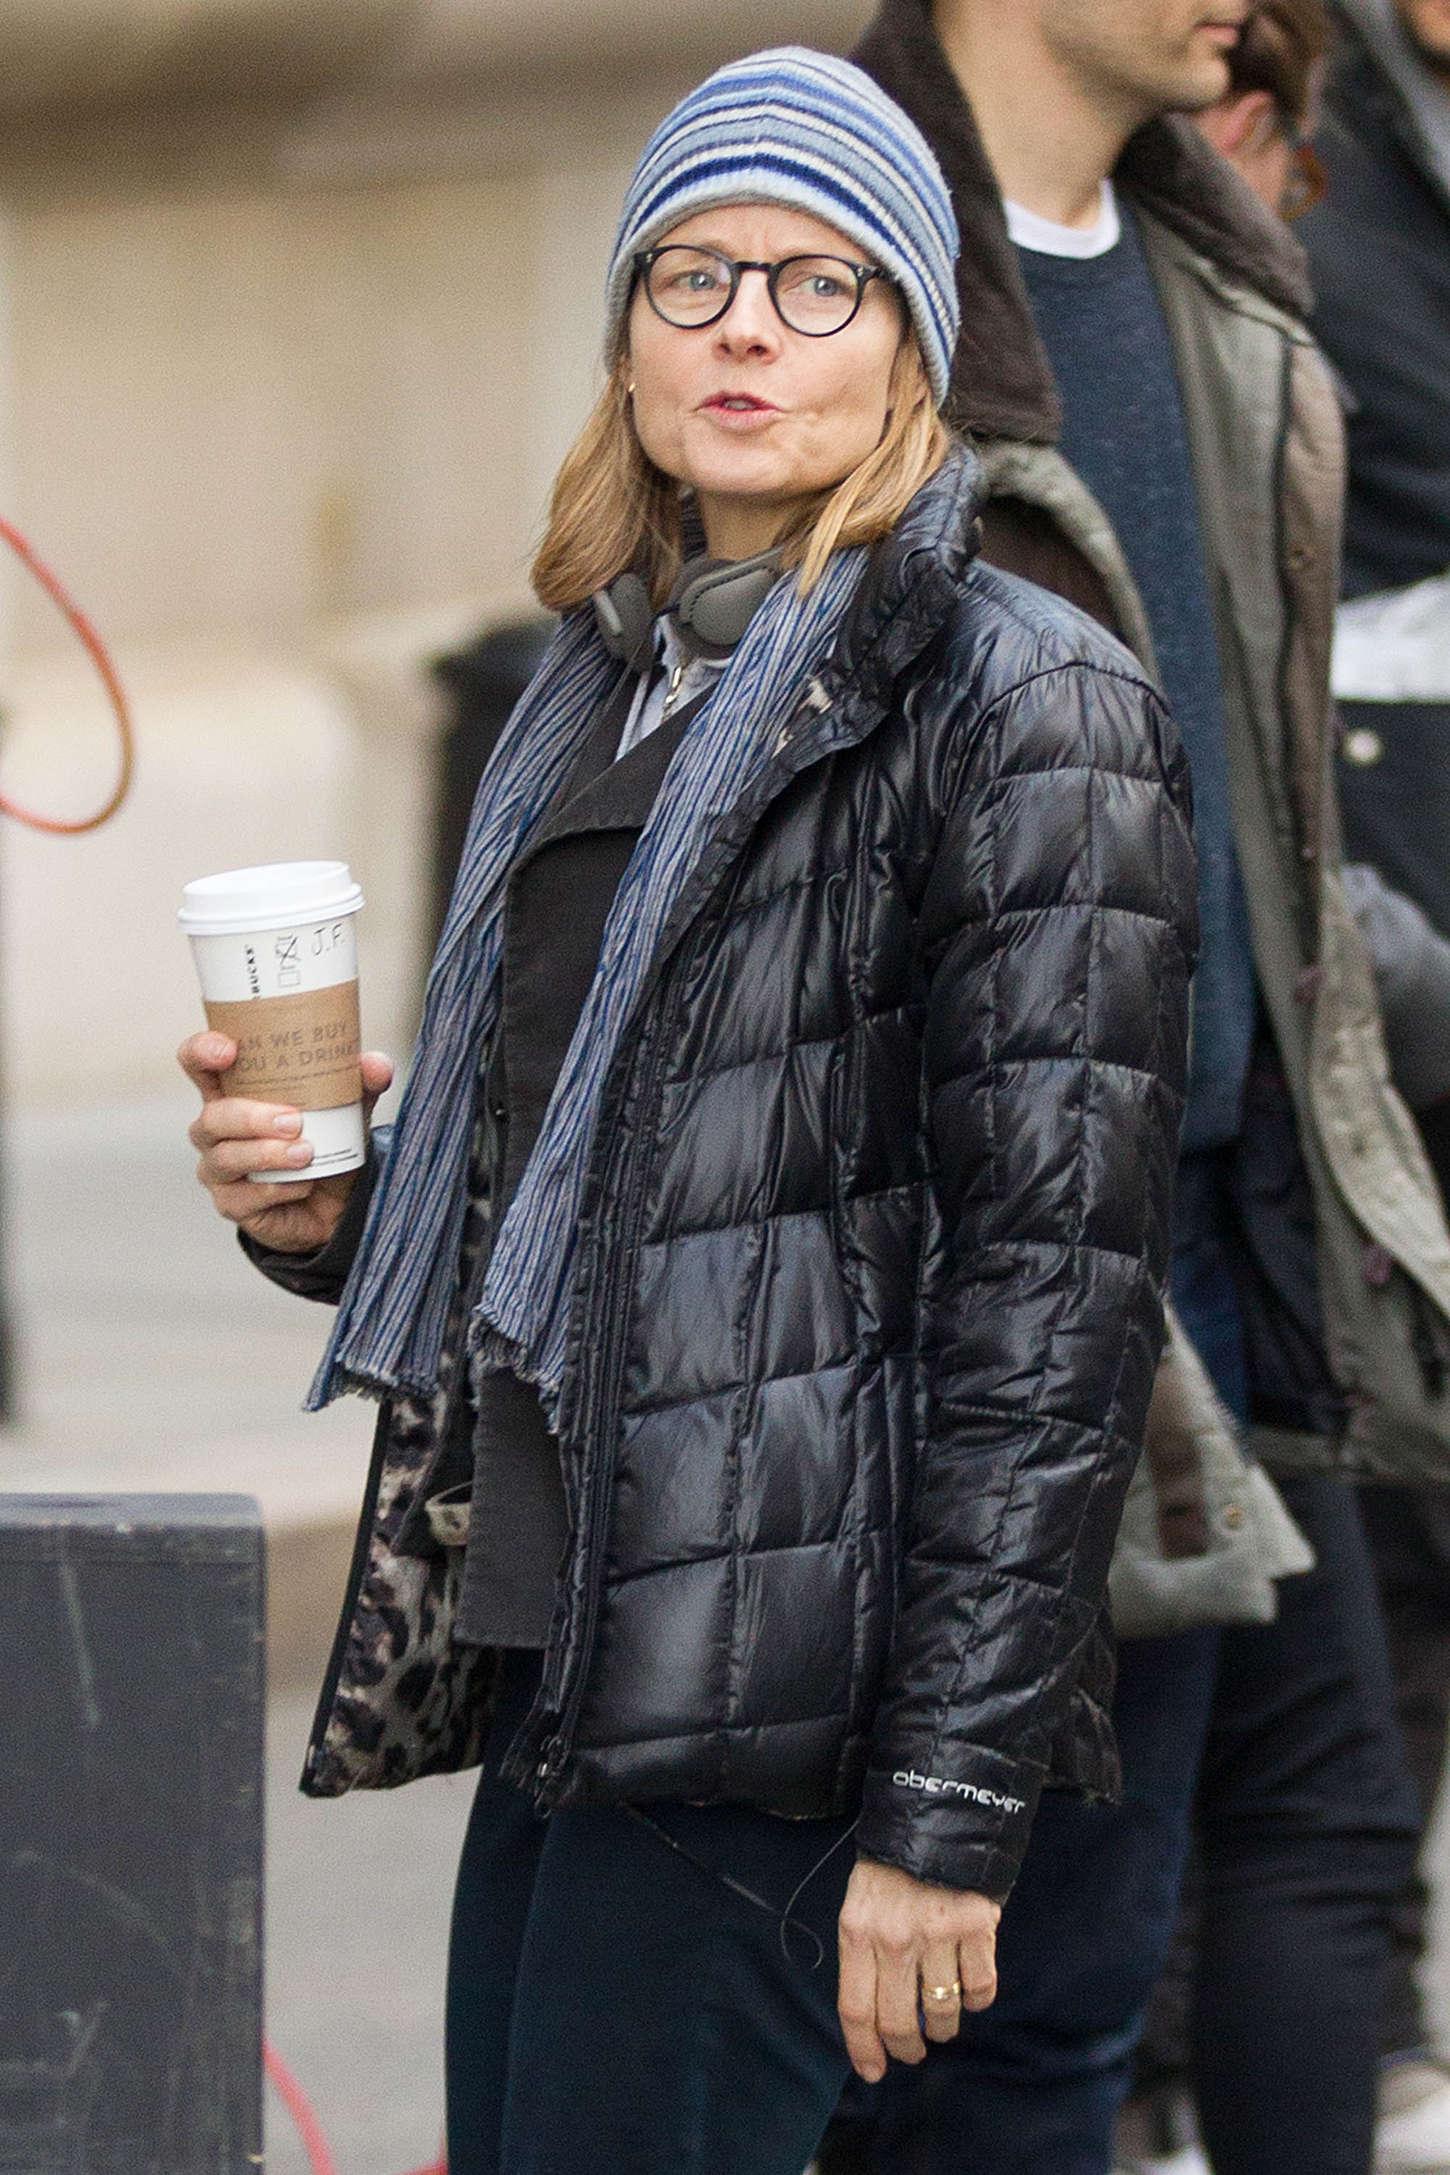 Jodie Foster Filming Money Monster in Wall Street